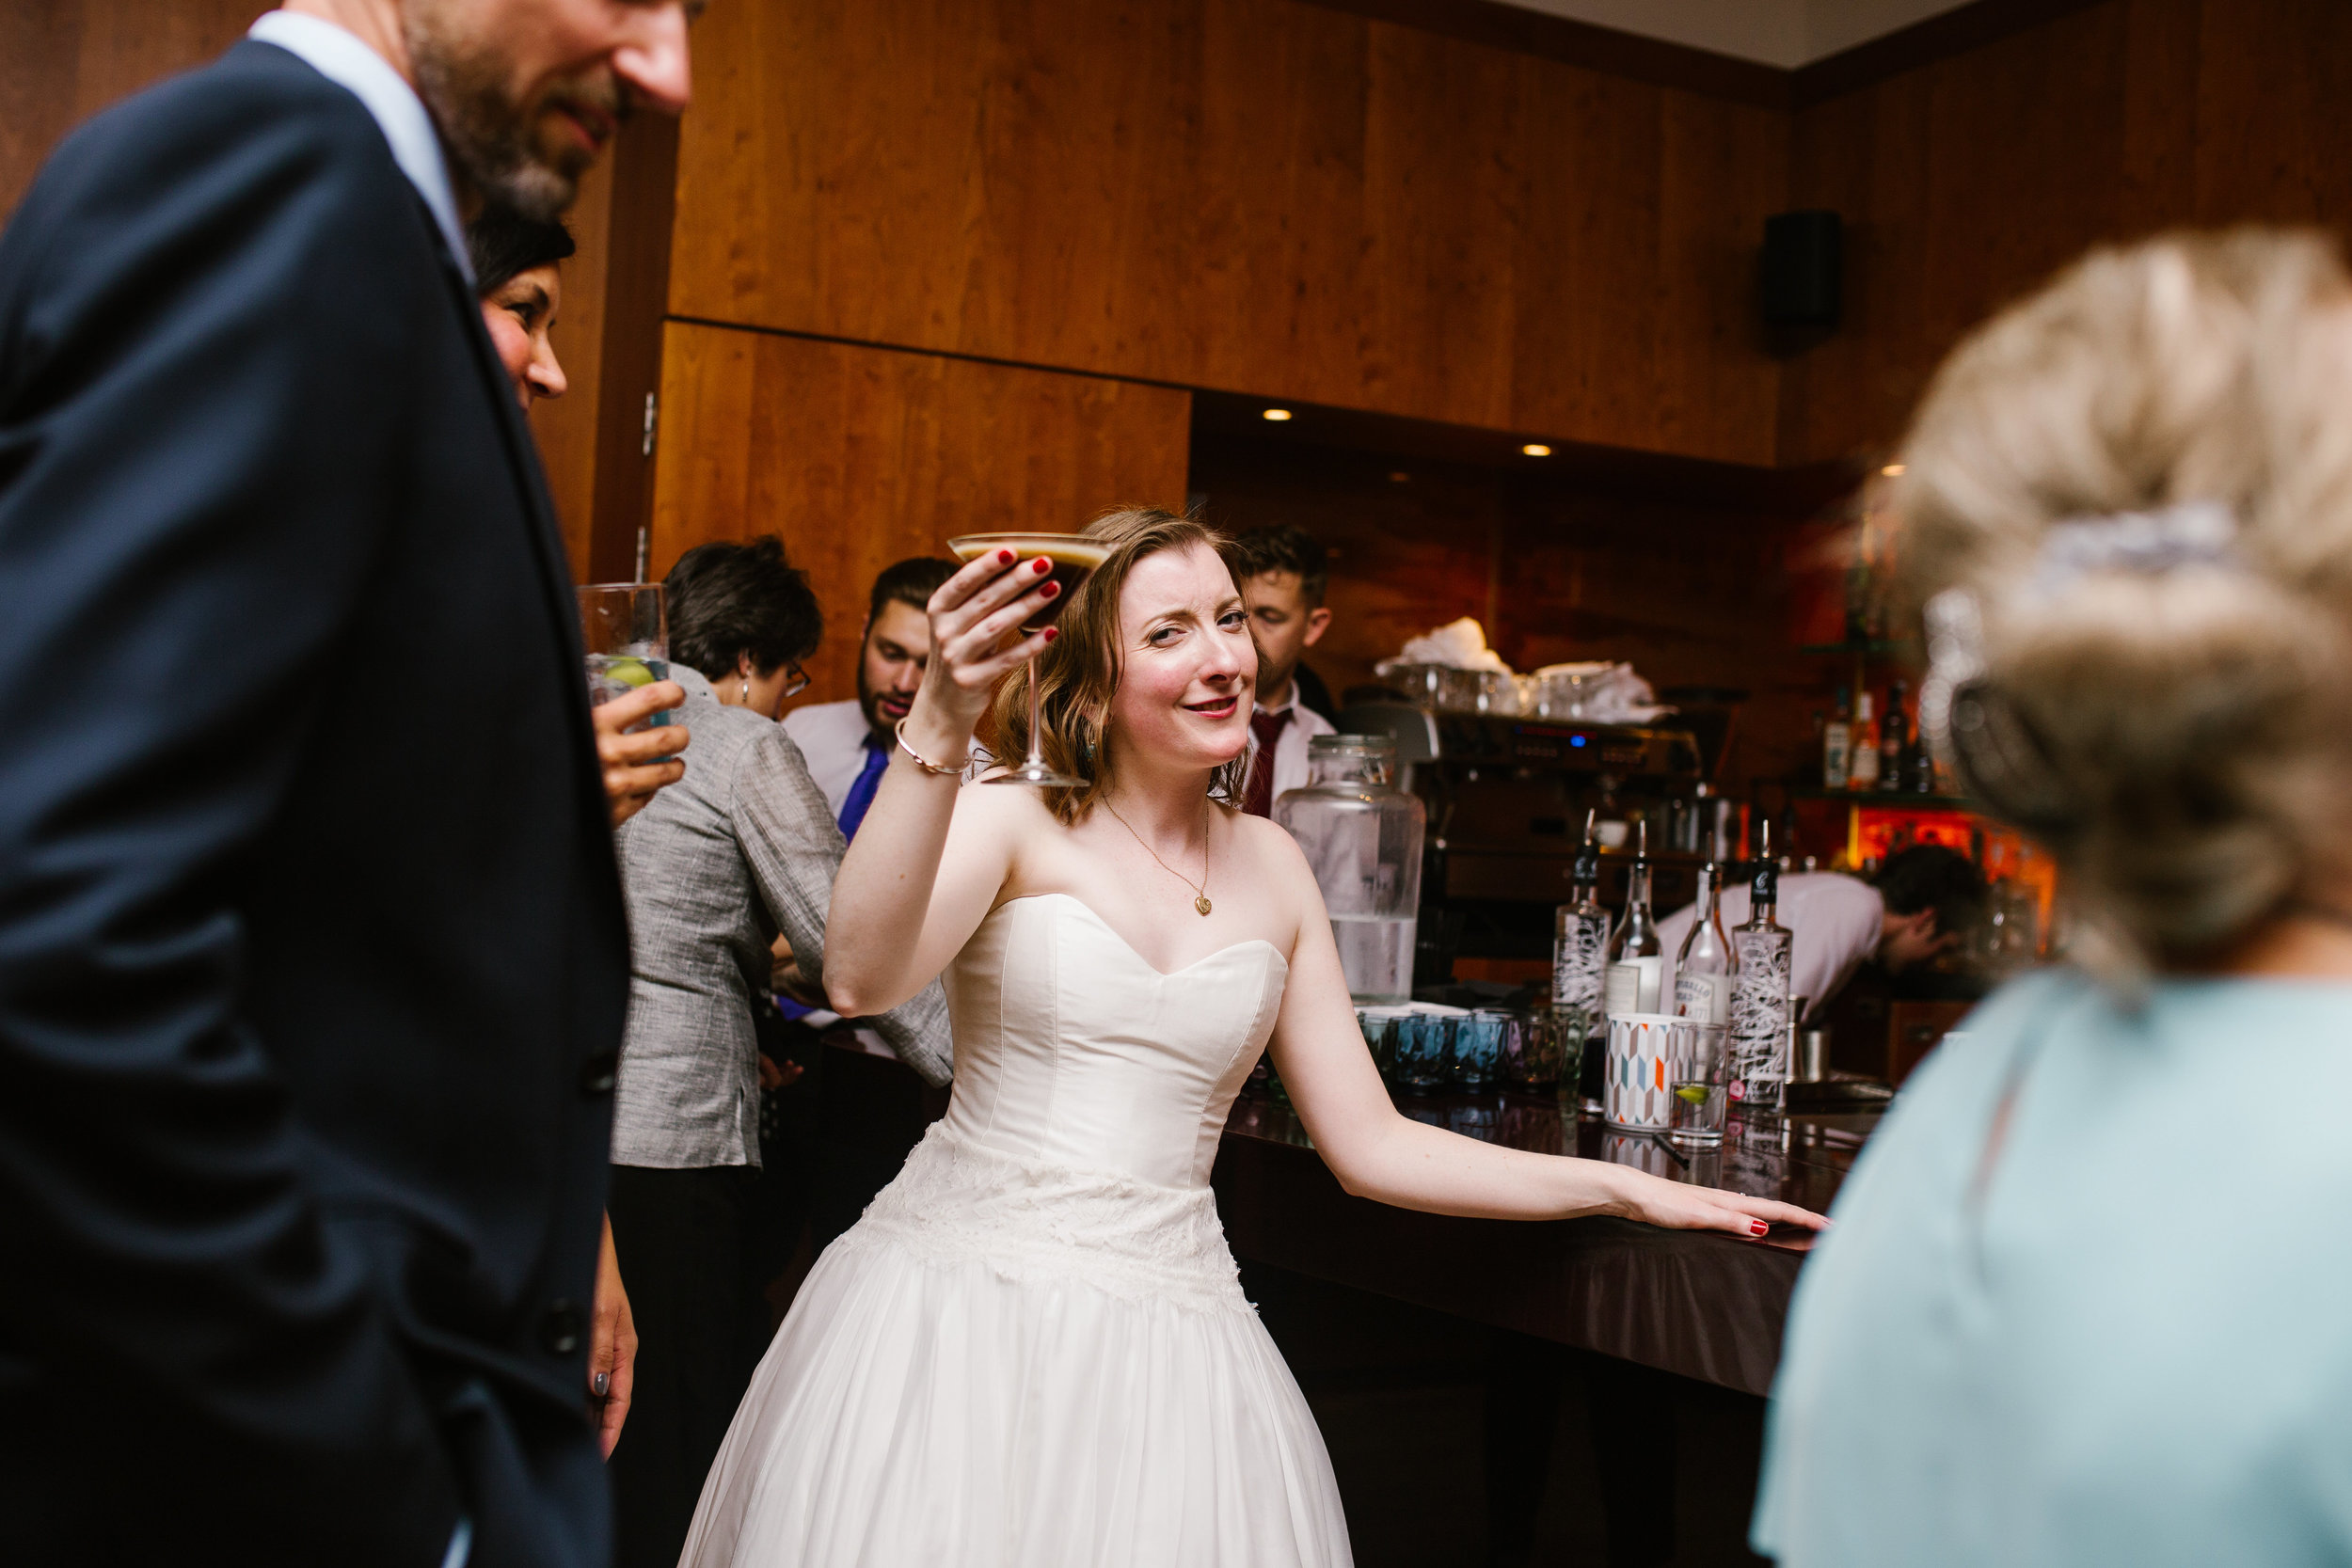 Cowley Manor, Cowley Manor weddinf, Cowley Manor wedding photographer, Cotswolds wedding, Cotswolds wedding photographer, staffordshire wedding photographer, autumn wedding, autumn wedding ideas-334.jpg